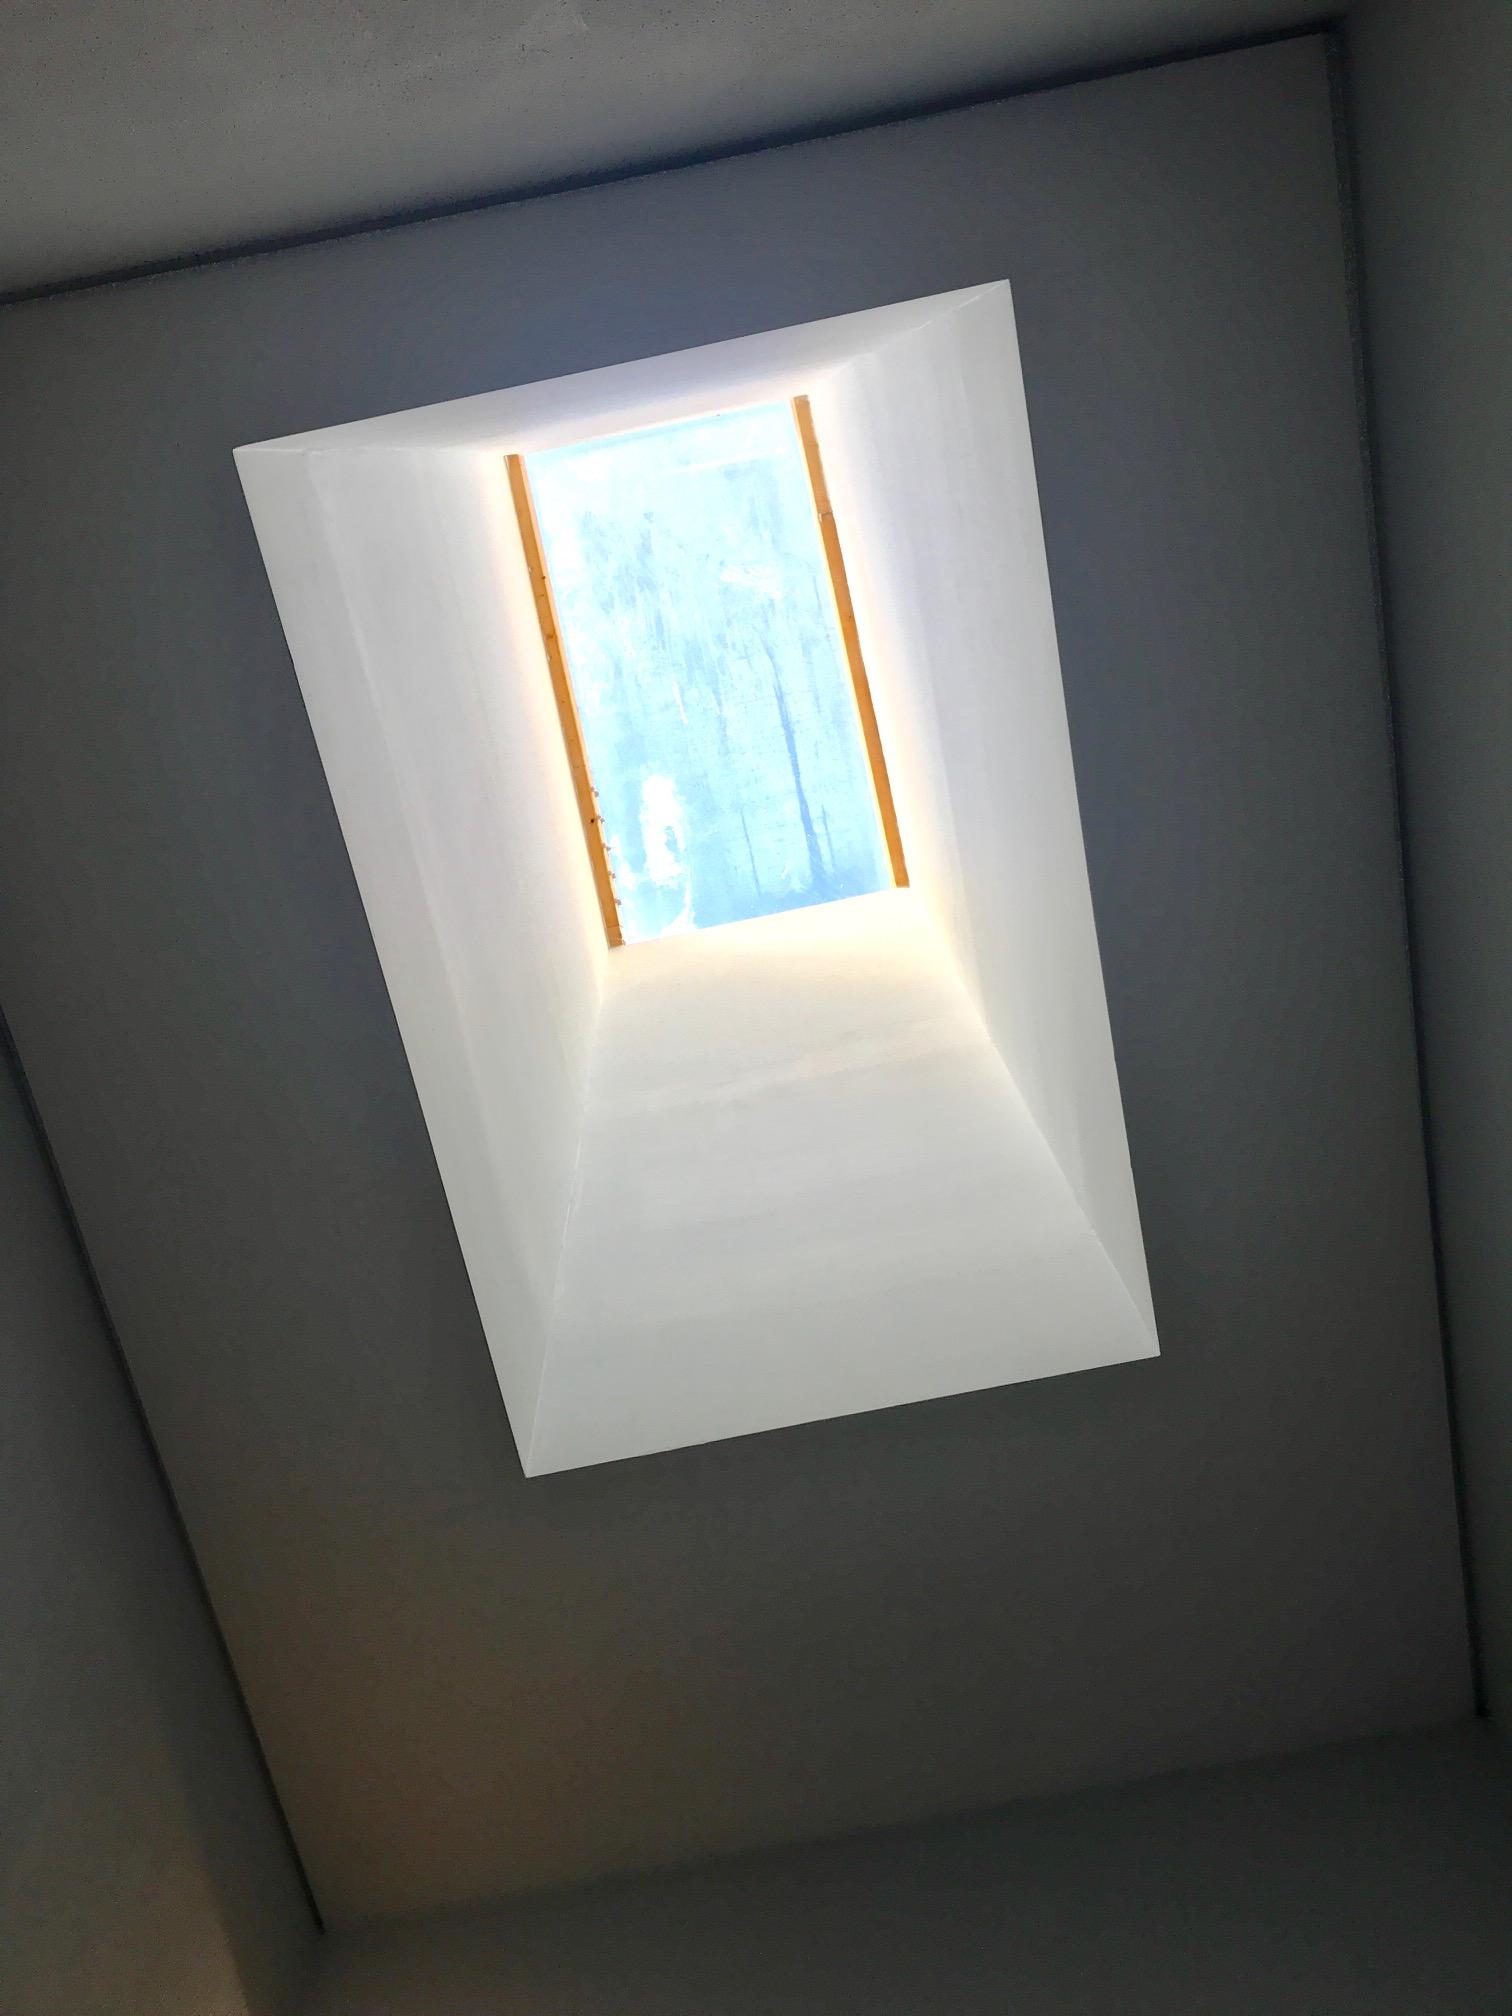 Claraboia da escada comum